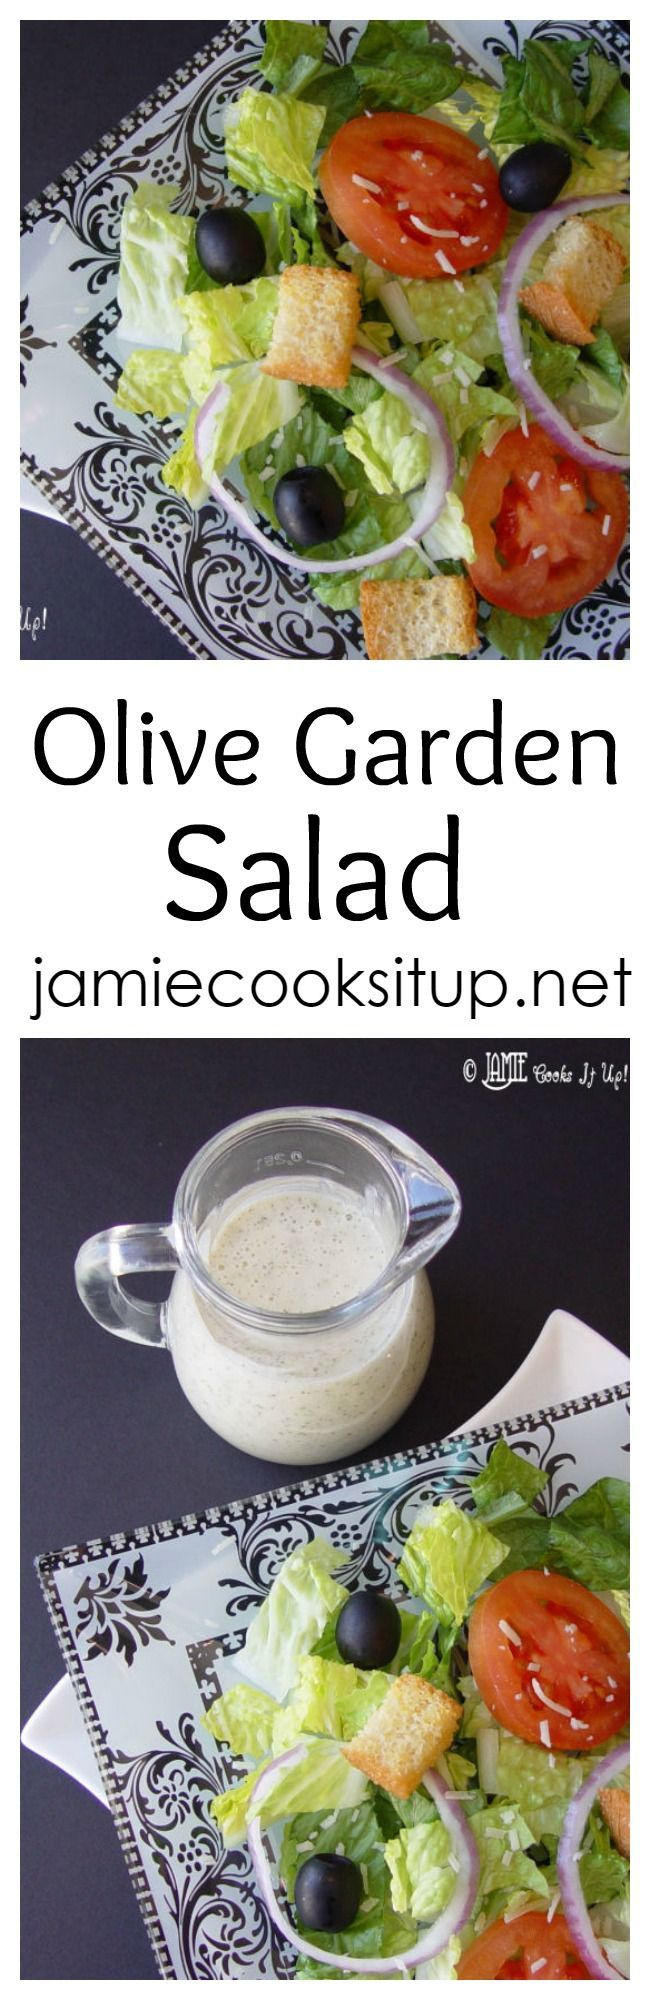 Best 25 olive garden salad ideas on pinterest olive garden italian dressing salad dressing for Olive garden salad dressing recipe secret